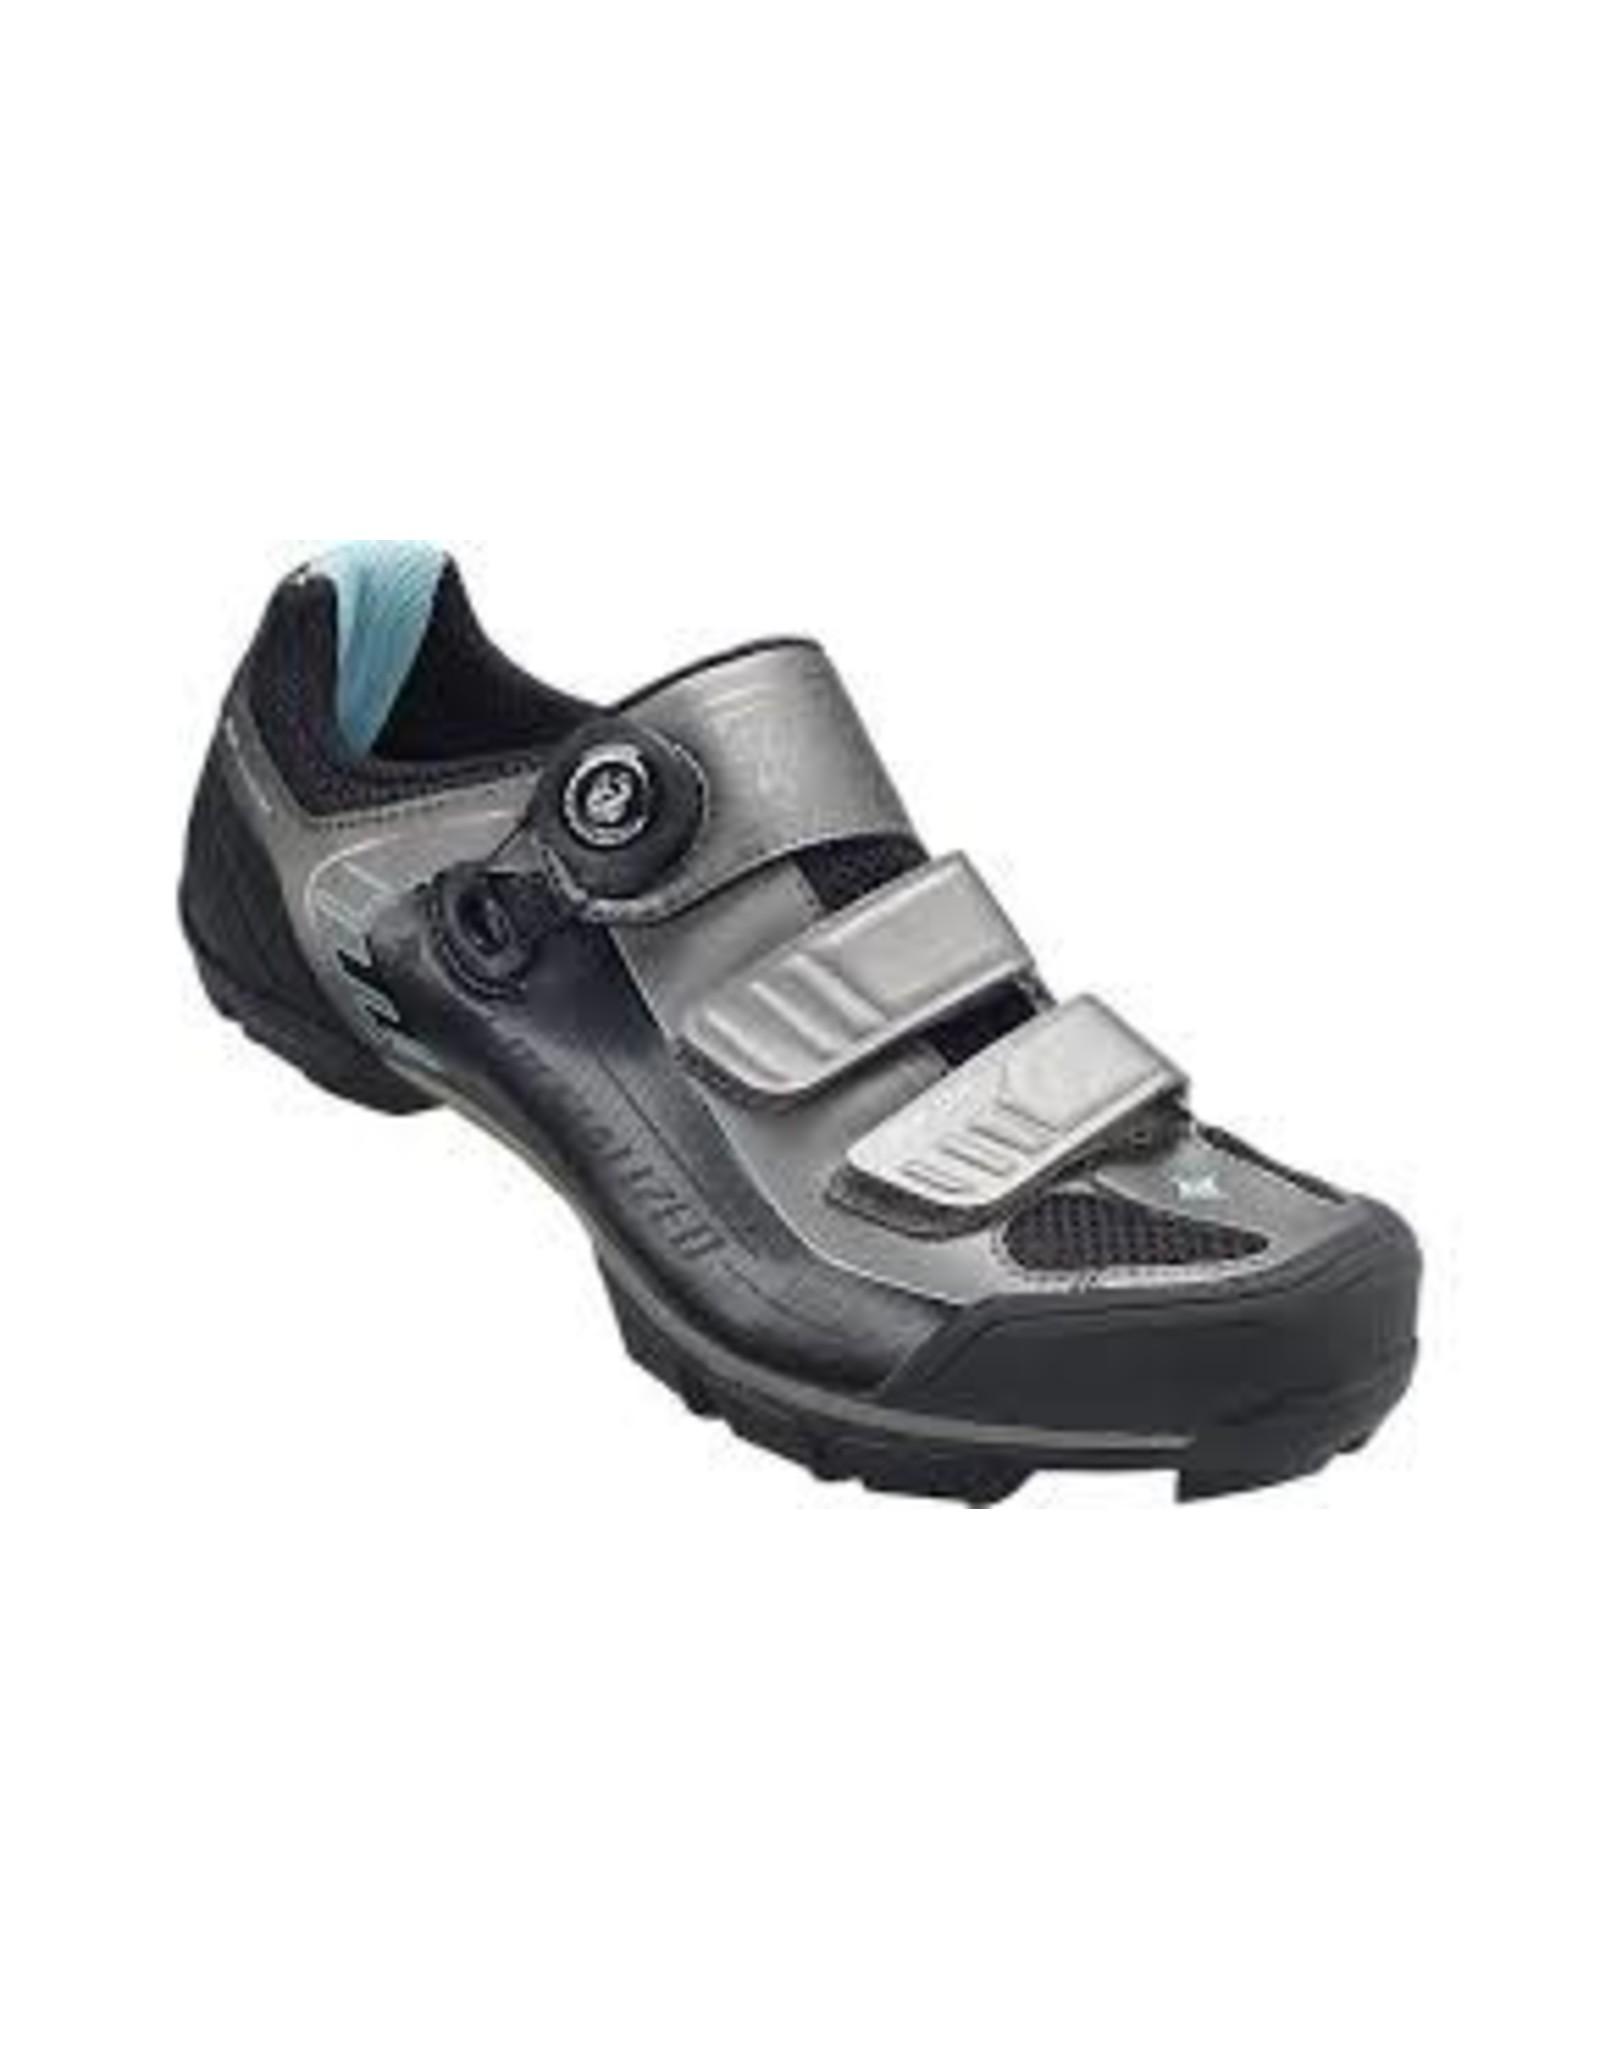 Specialized Shoe Spec Motodiva Mtb Wmn Ti/Blk 36/5.75